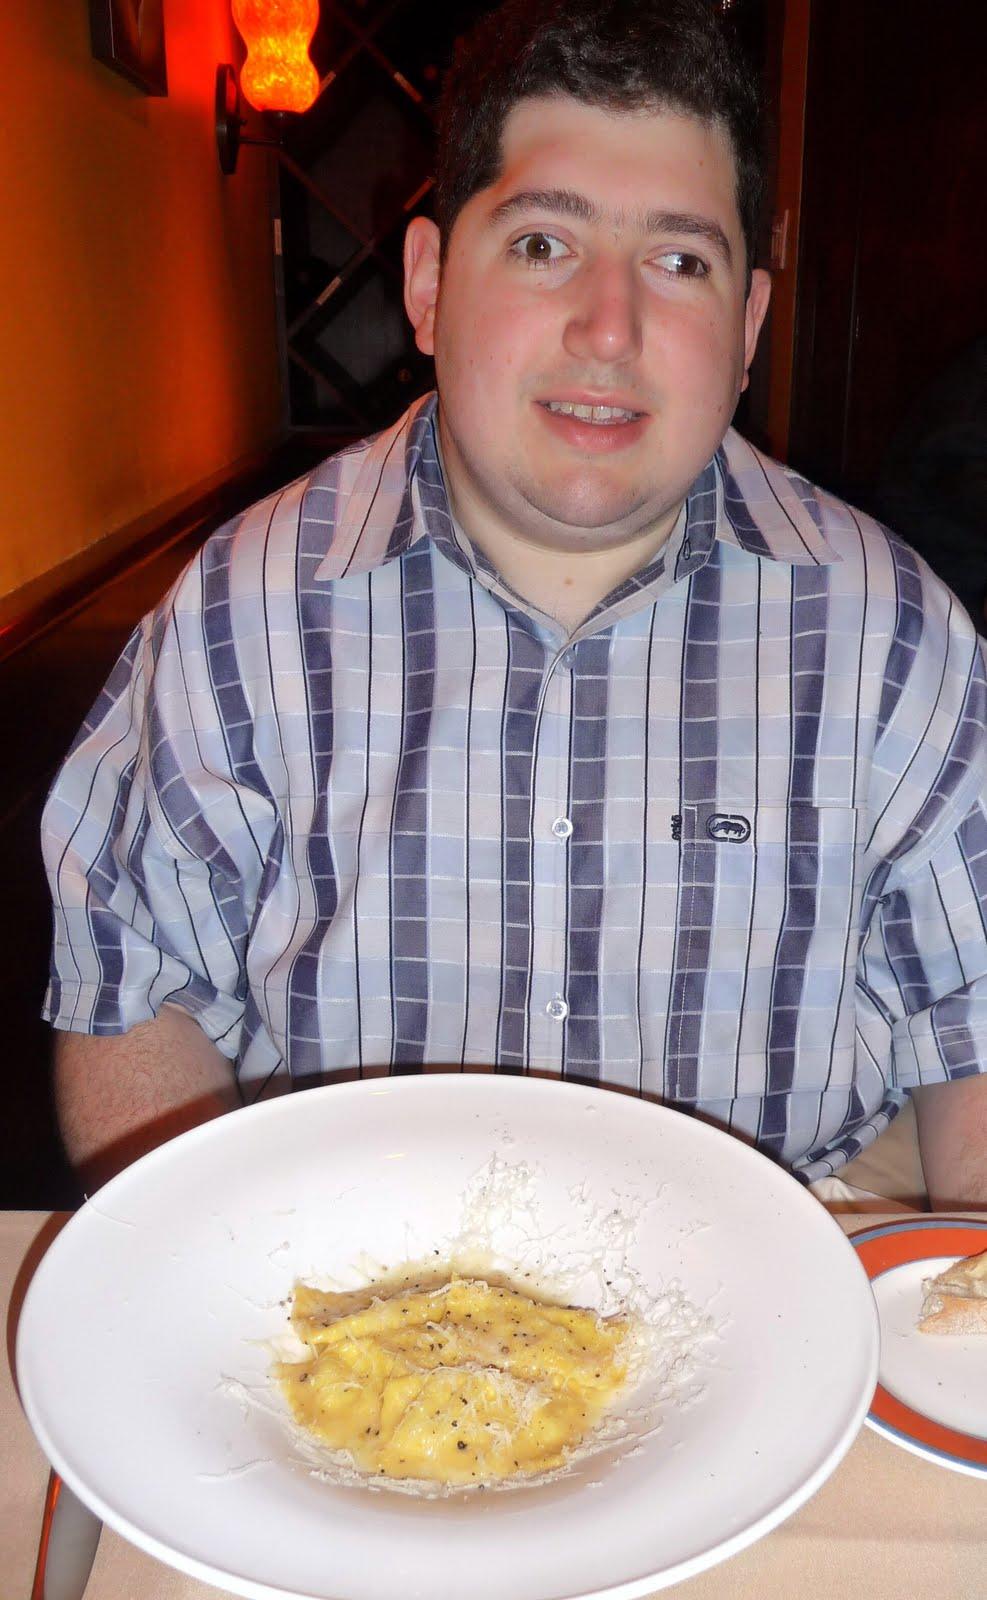 Daniel Aronoff sitting across the table from me at Felidia, waiting to taste his pecorino ravioli